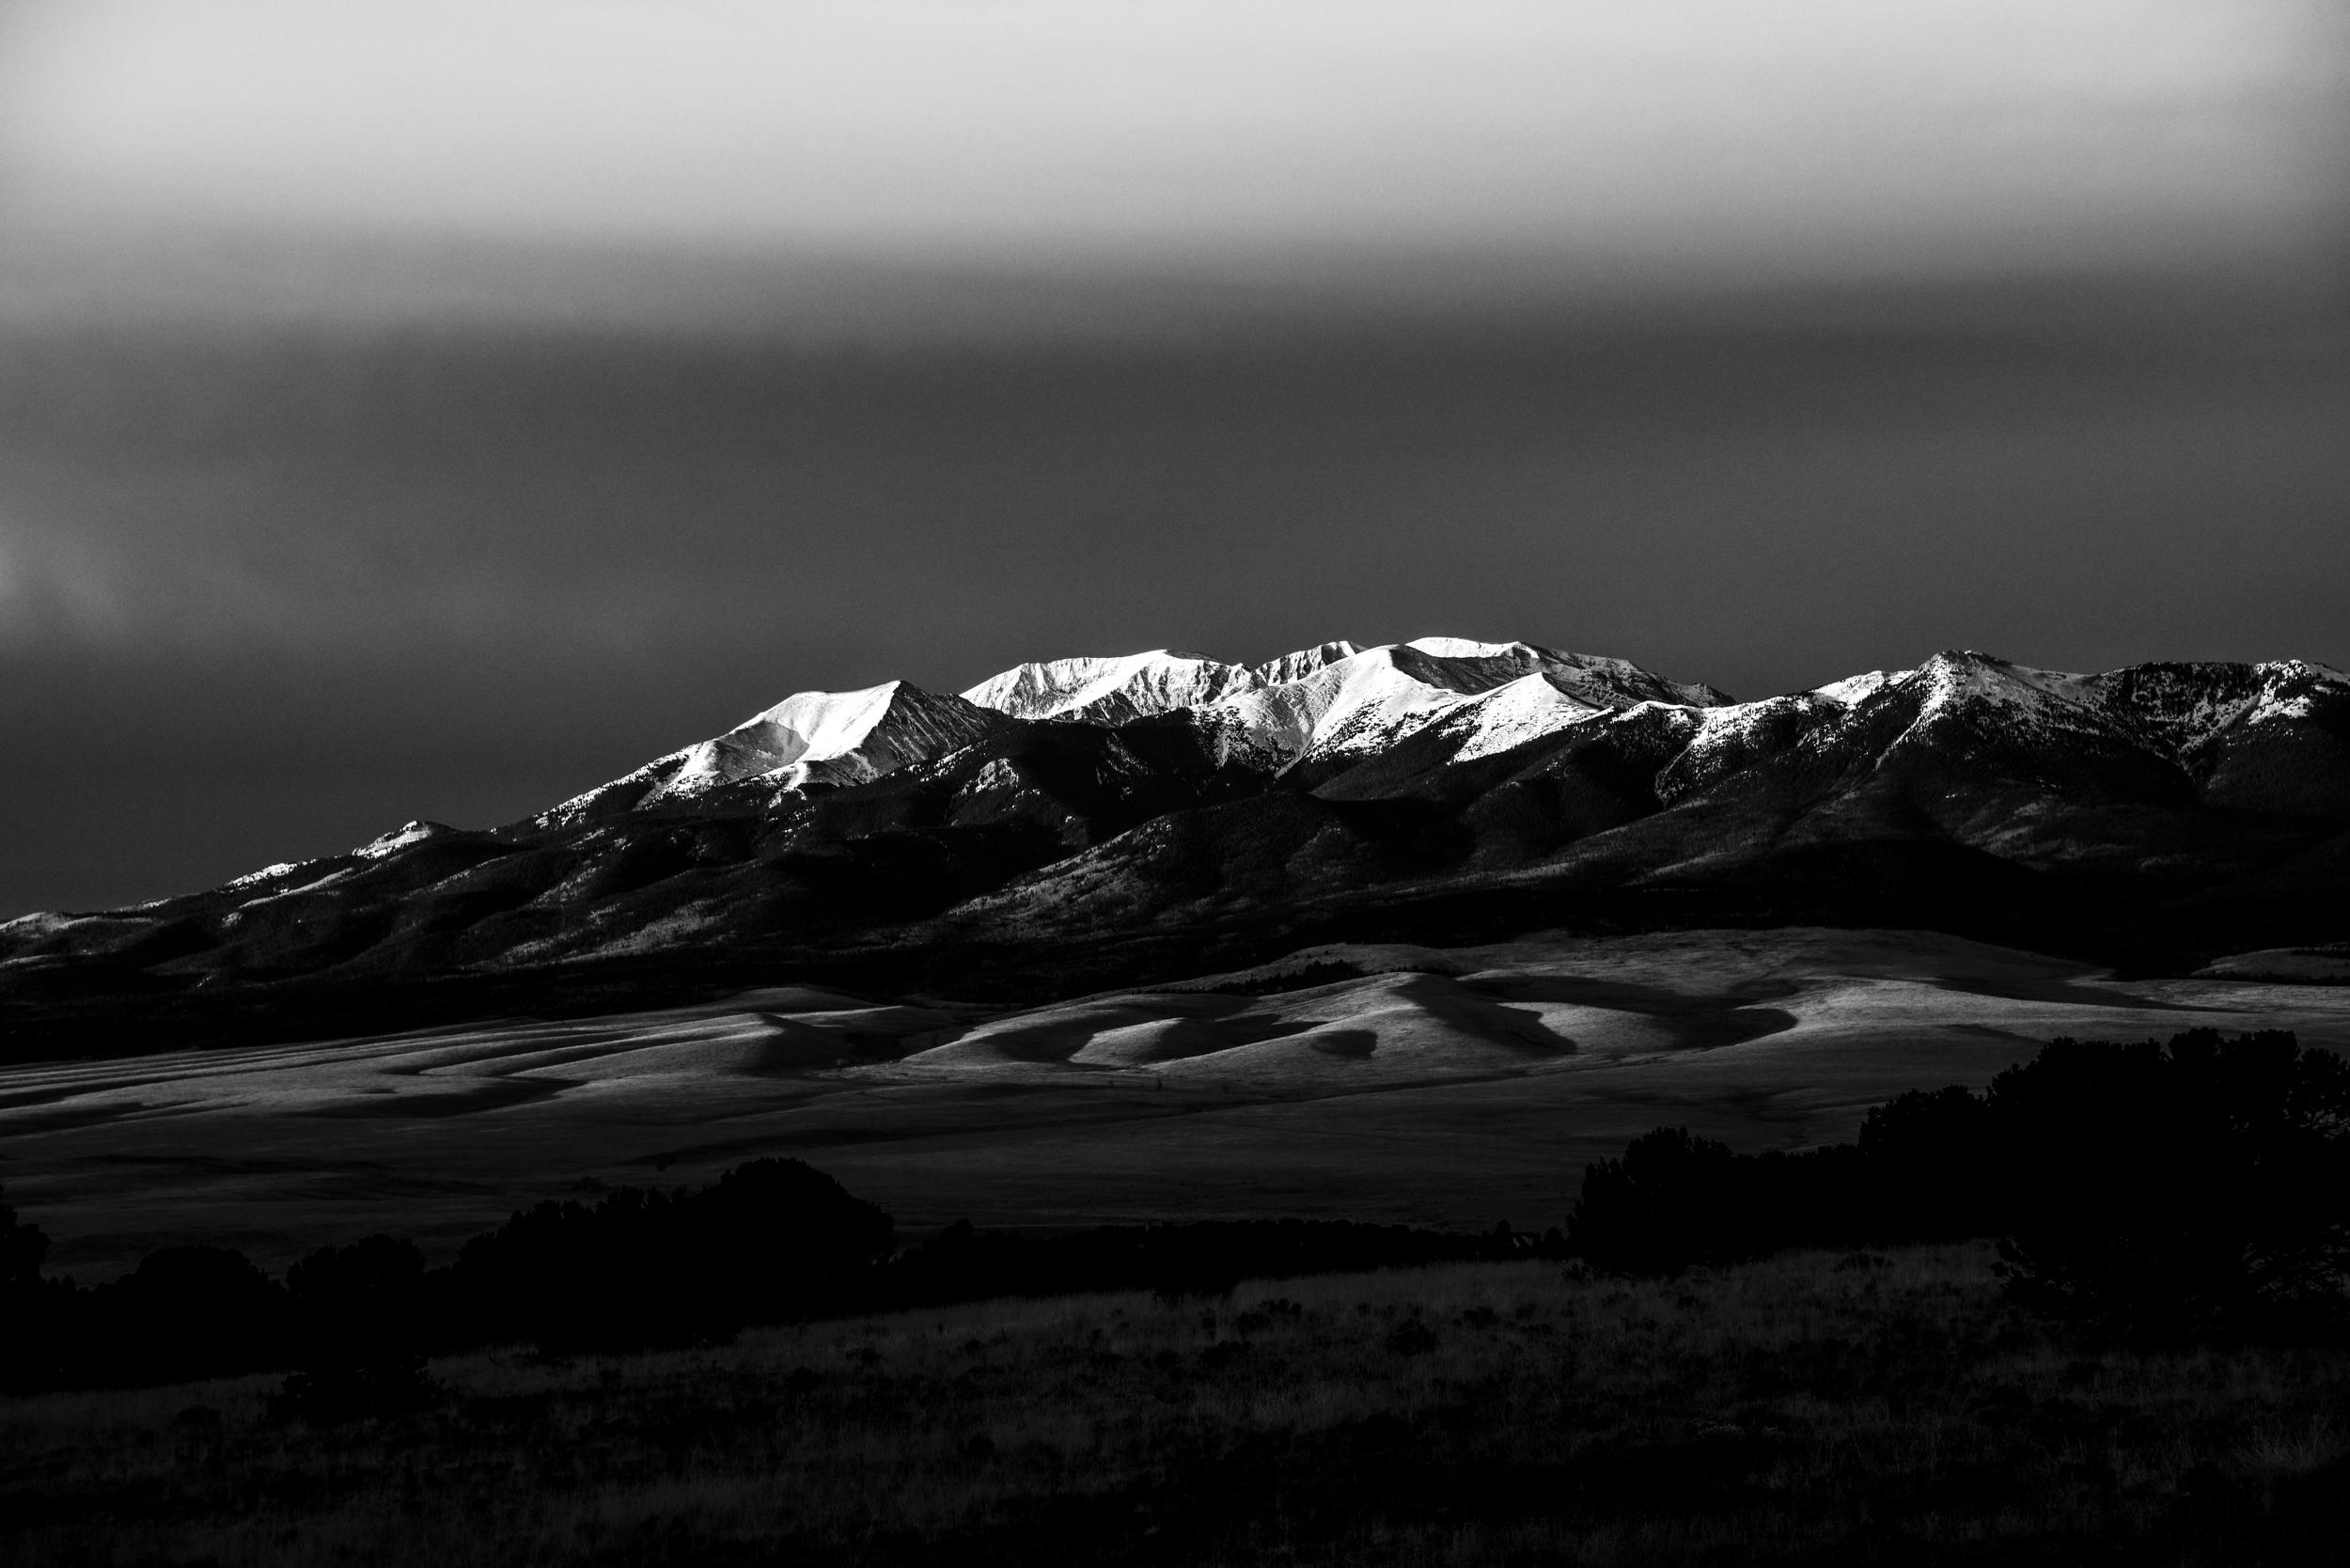 Mount Herrard in Colorado